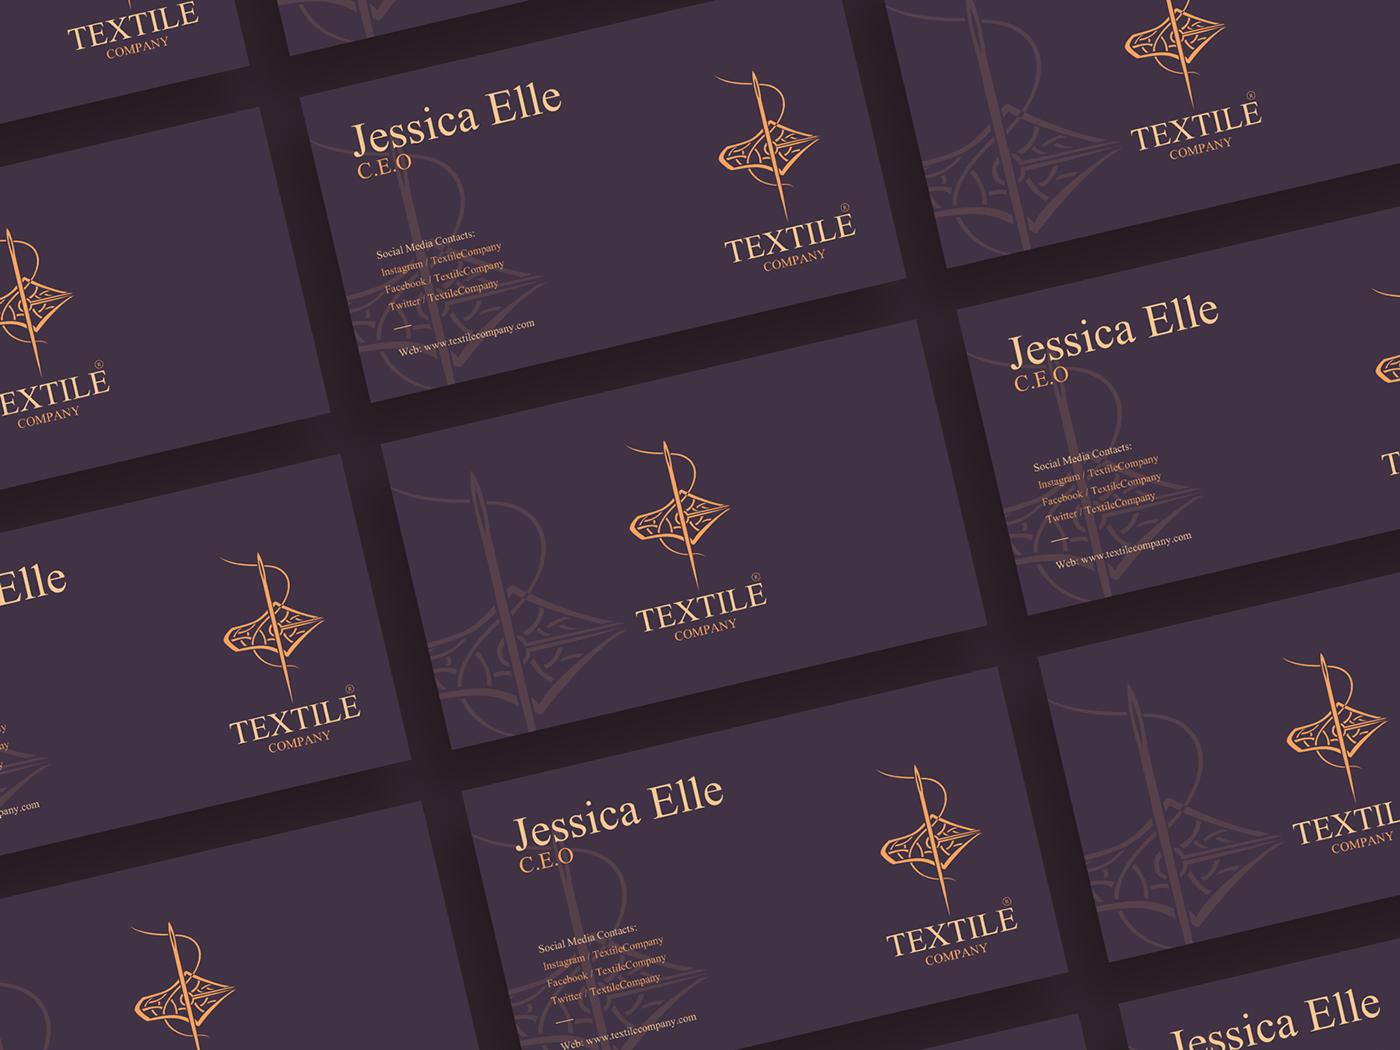 business card,Business card design,Business card template,Business Cards,download,Free Template,freebies,template,templates,textile